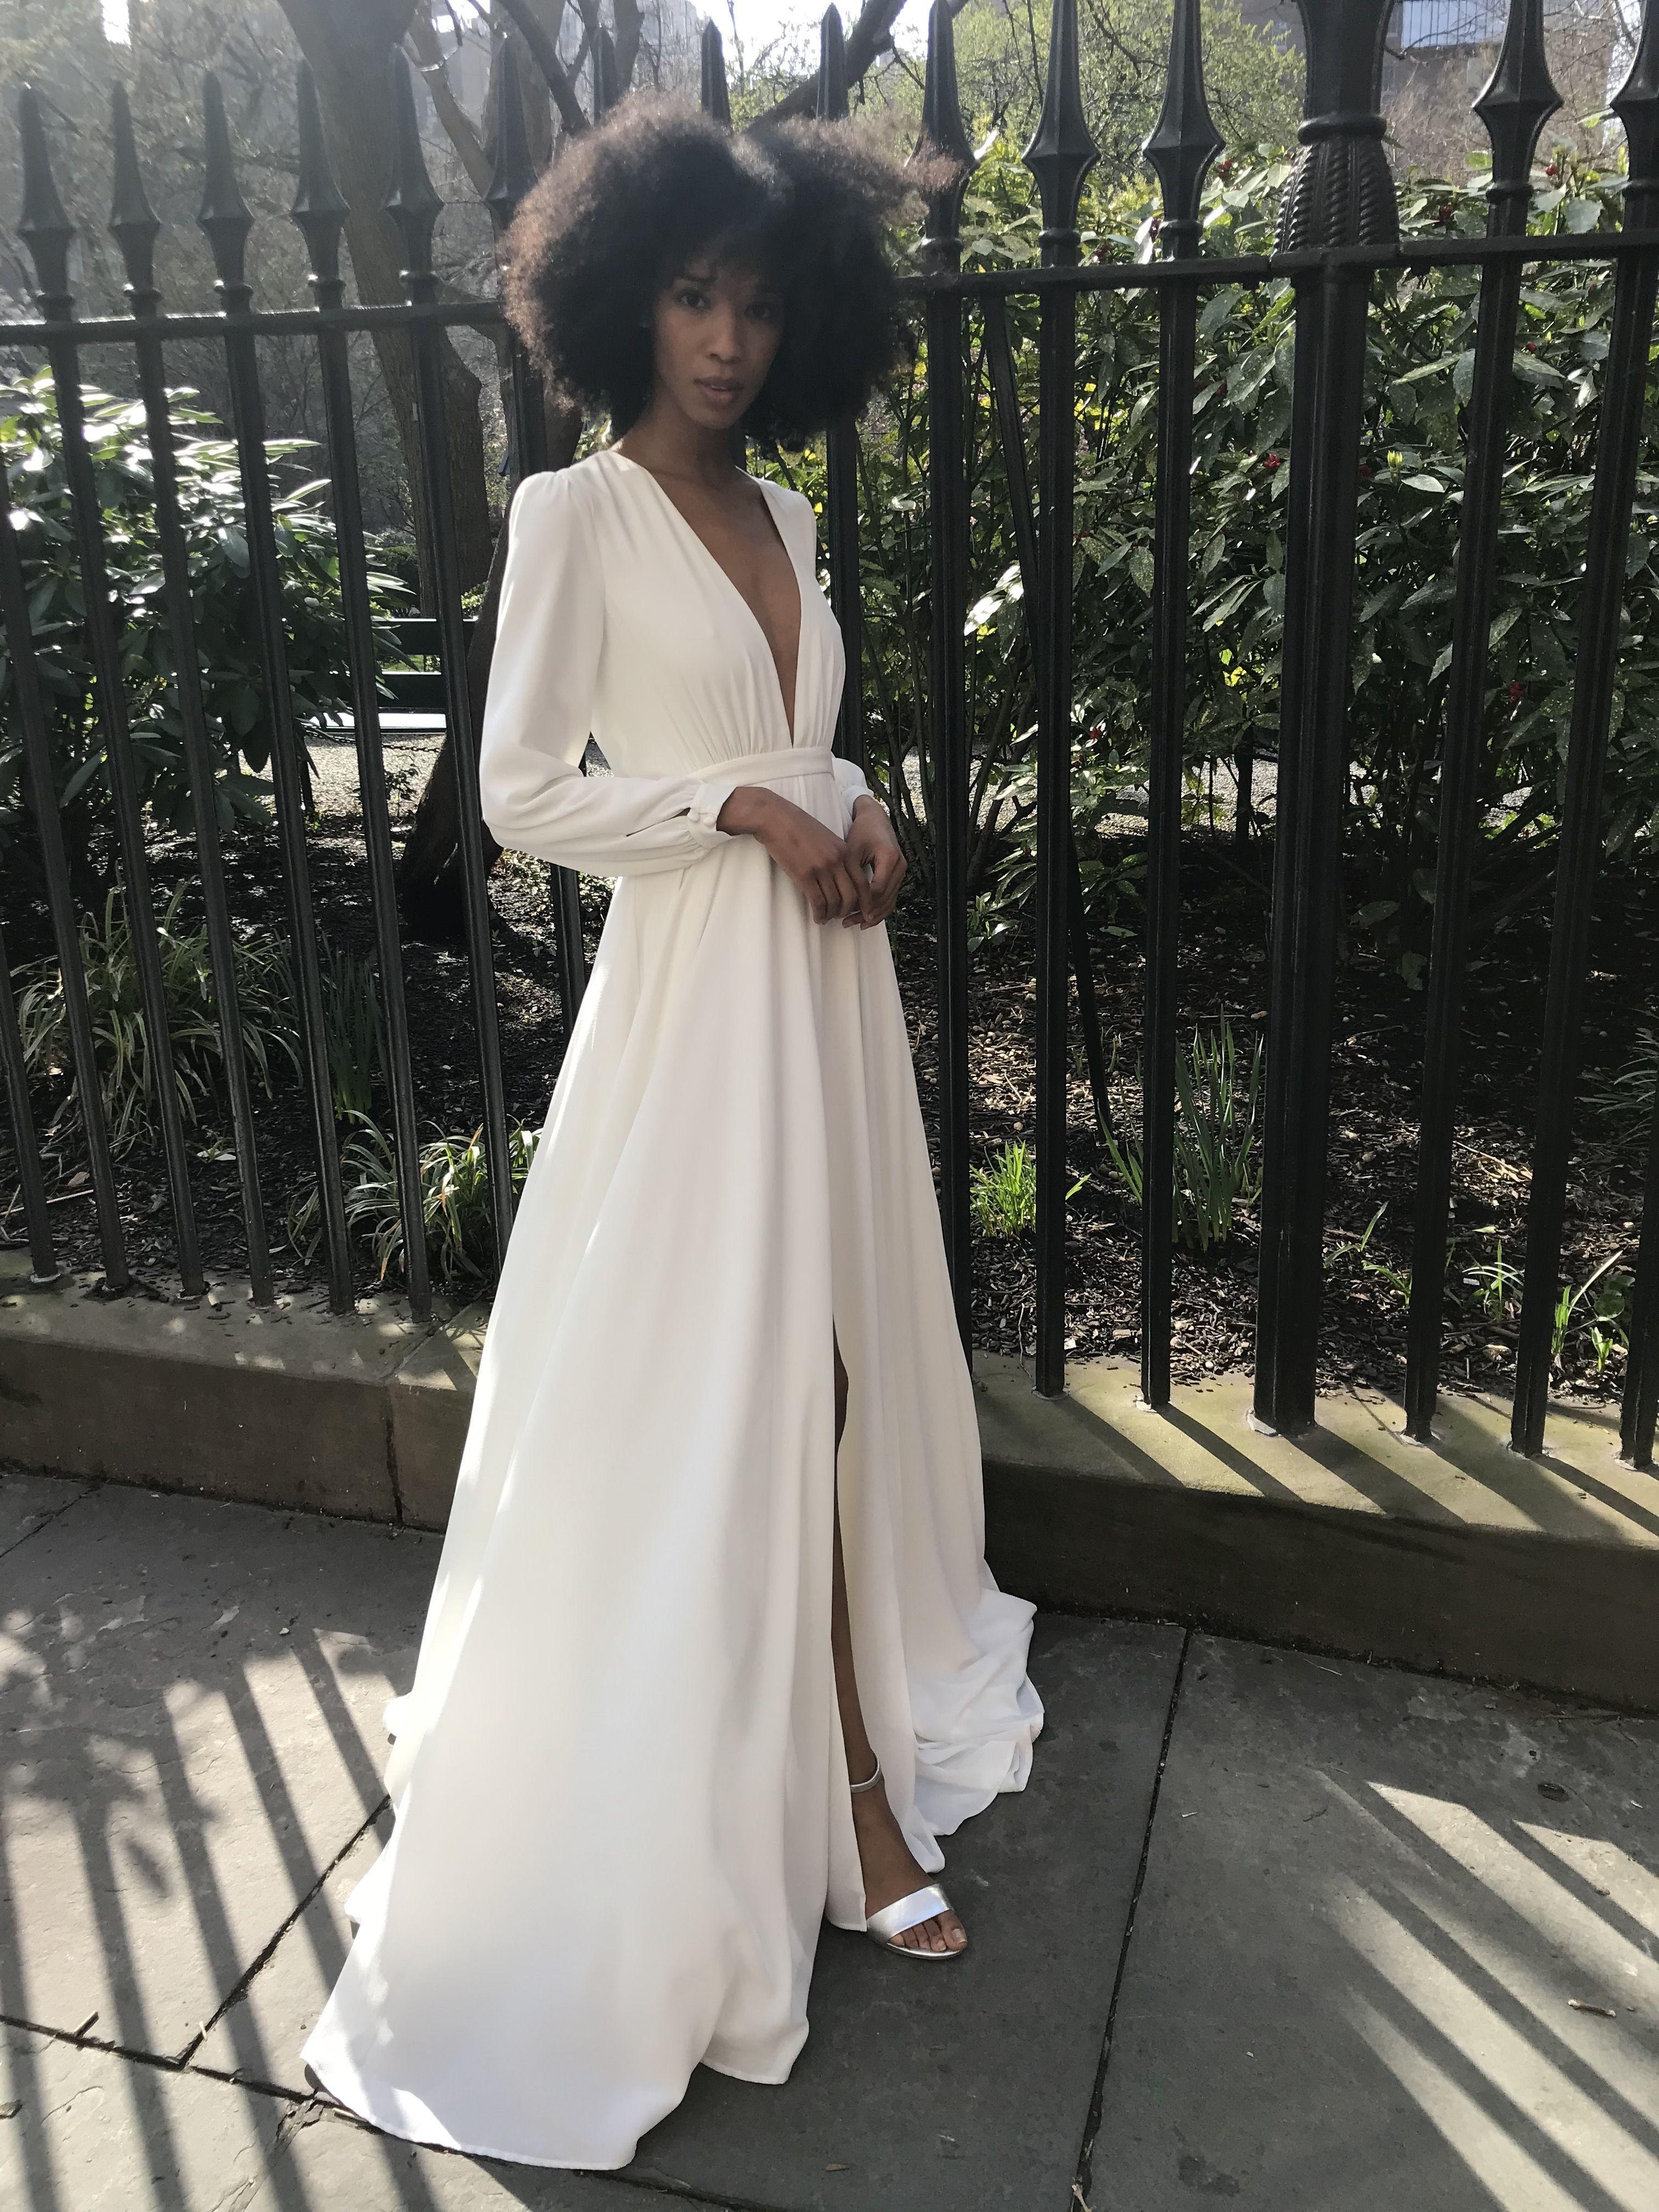 Joanna August Bridal Wedding Dress At Nordstrom Under 1000 Modern Gorgeous Wedding Dress That W Modern Bridal Dress Wedding Dresses Boho Wedding Guest Outfit [ 4032 x 3024 Pixel ]